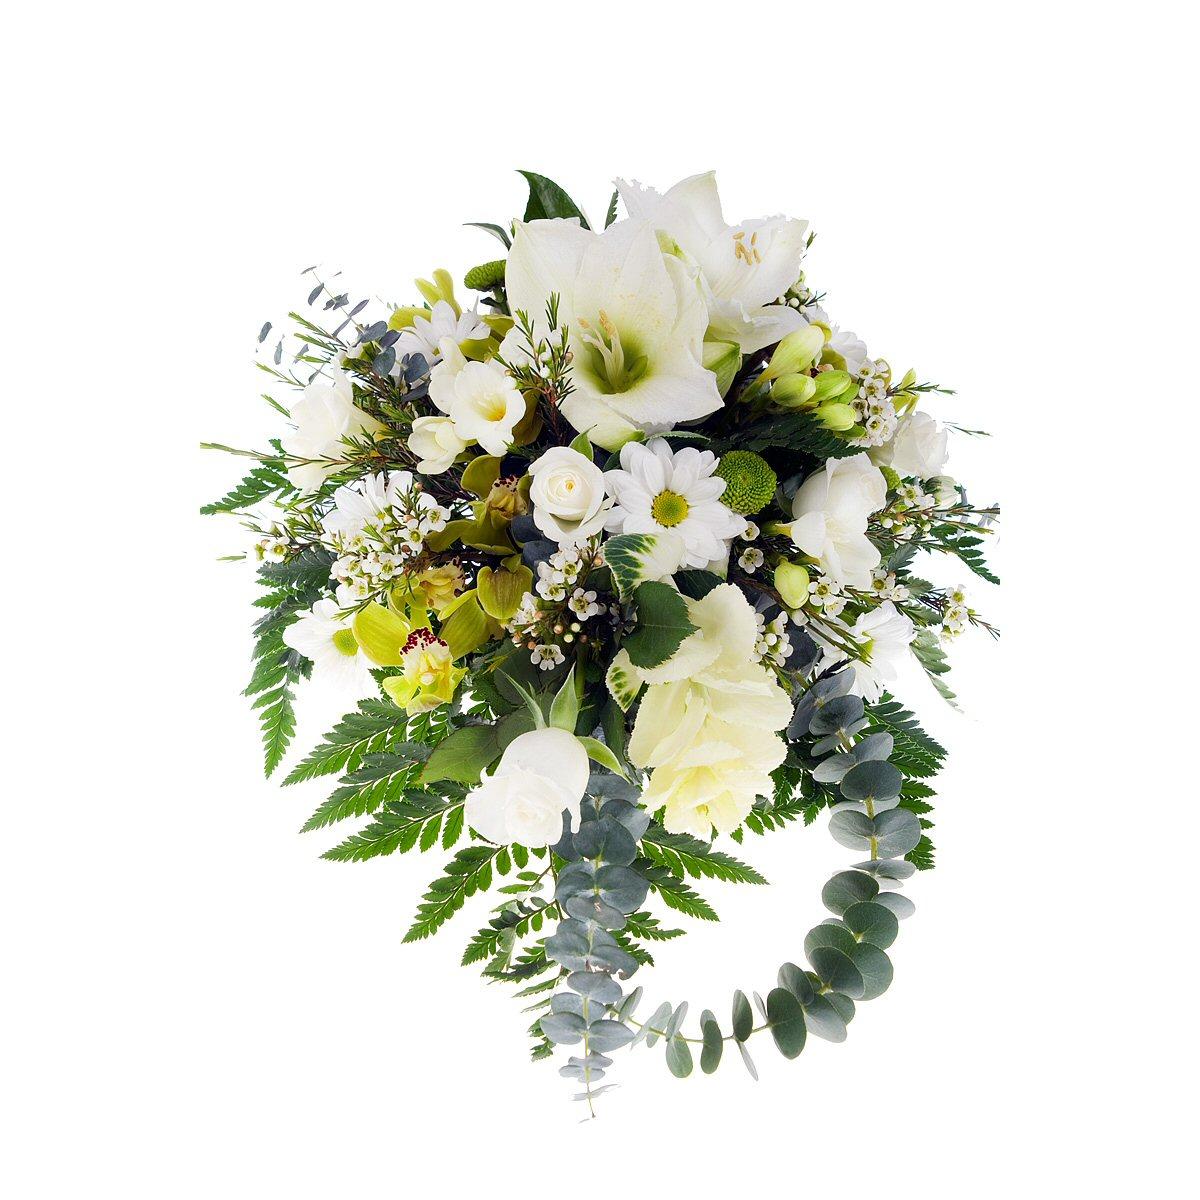 Sympathy shanes flower market sympathy6 izmirmasajfo